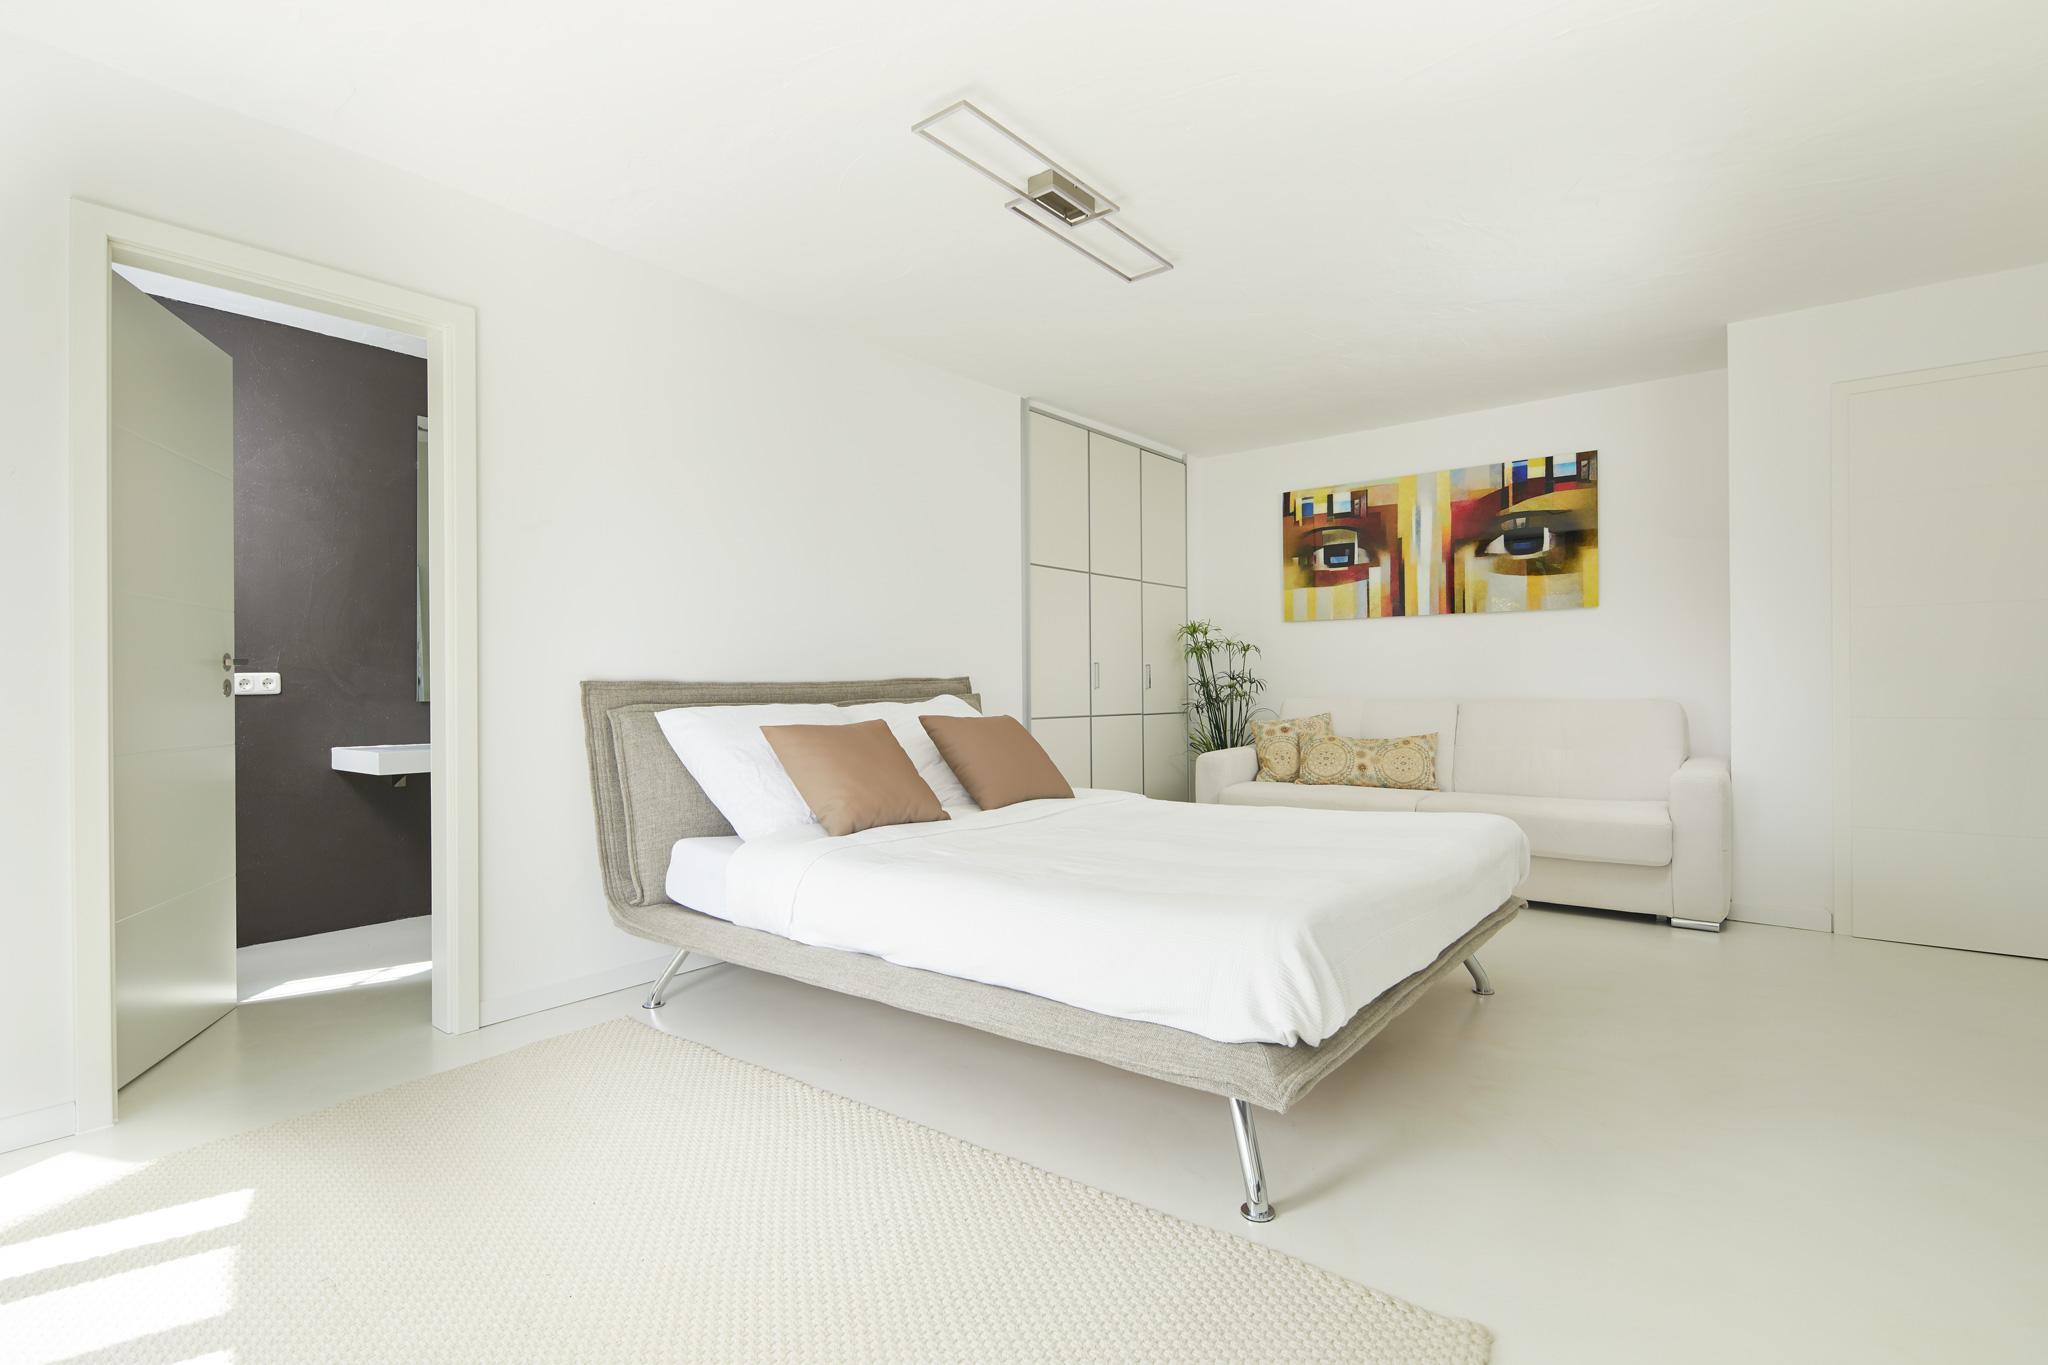 Bedroom_4.2.jpg